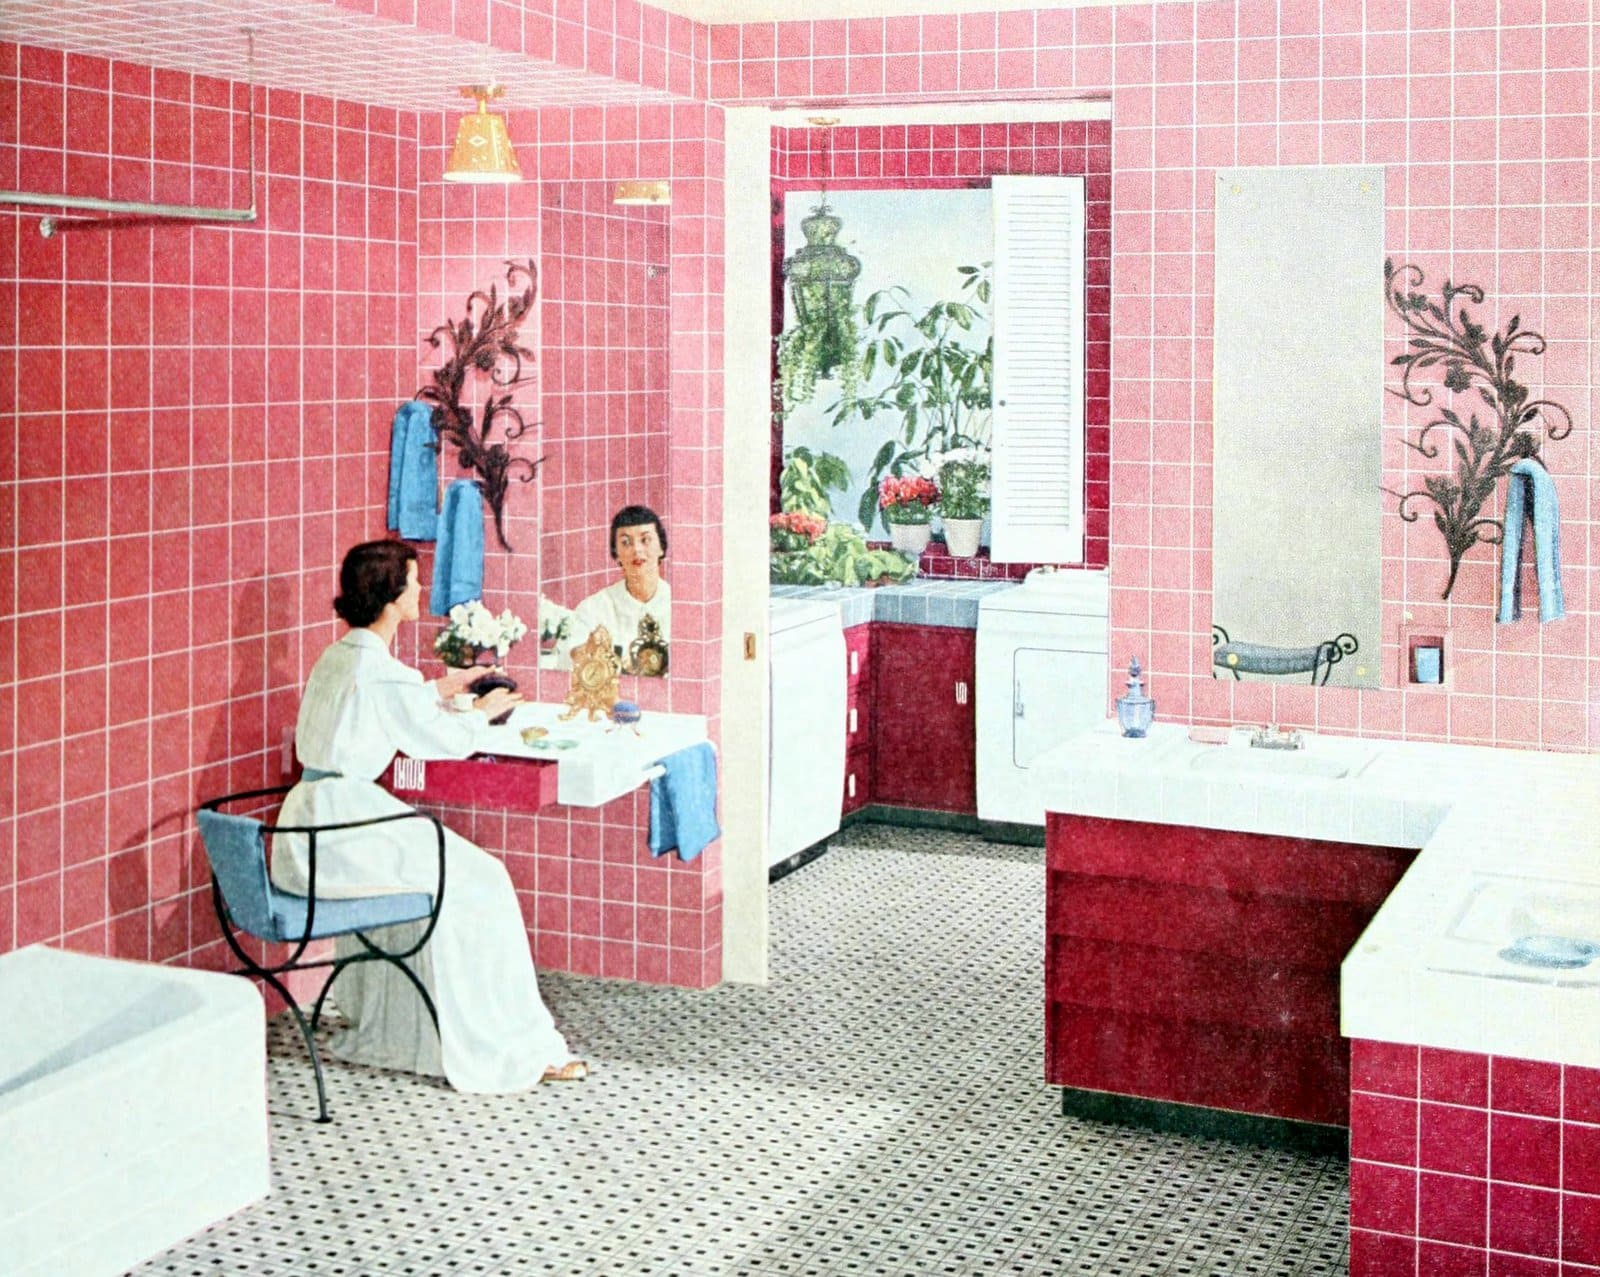 Pink retro bathroom decor from 1954